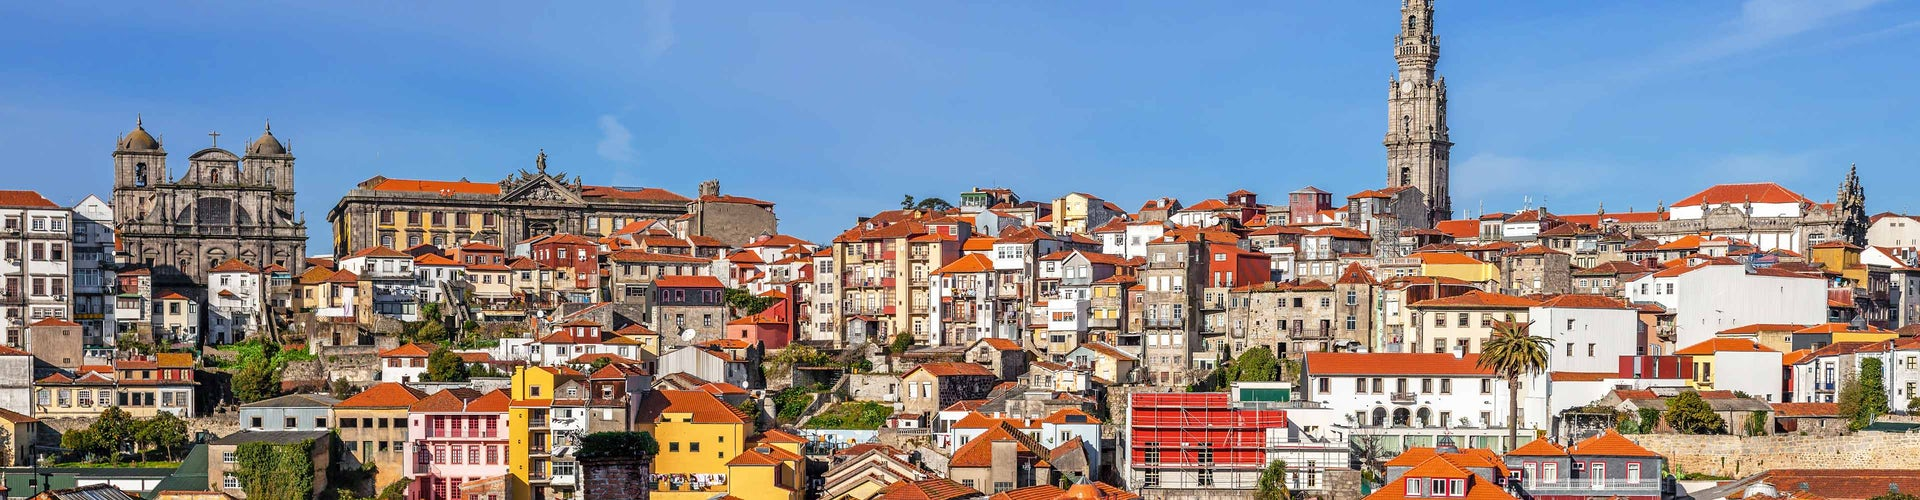 Oporto Tour Dia Completo